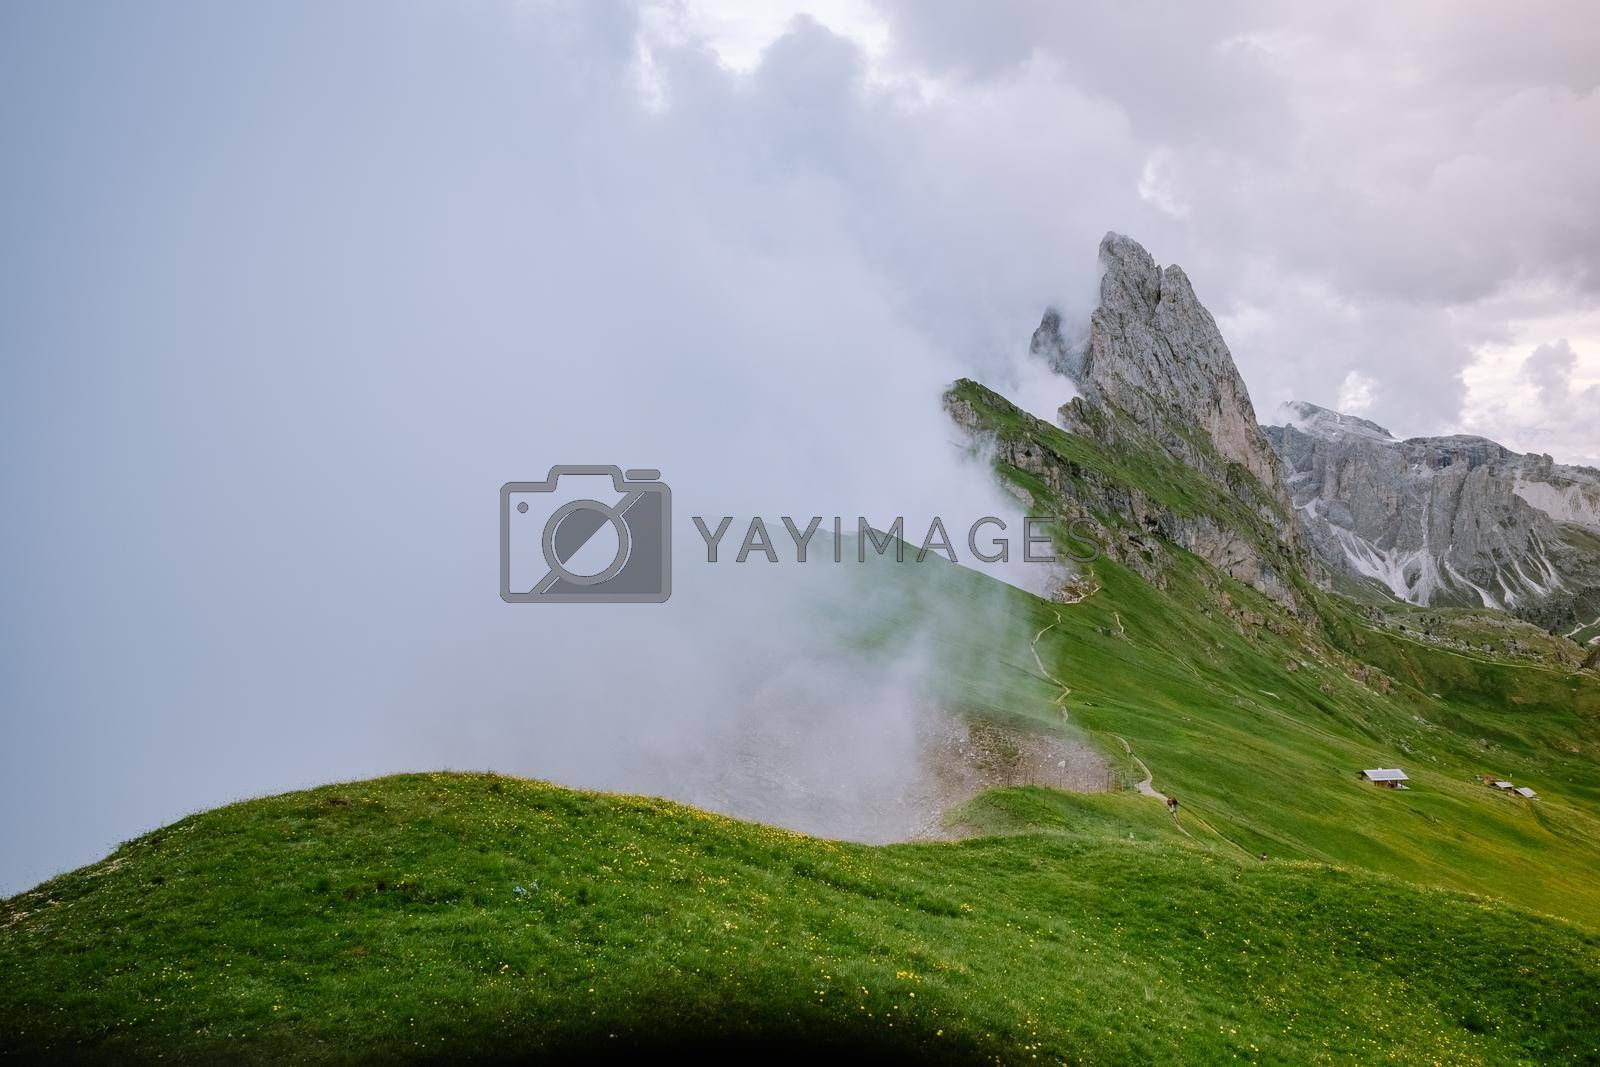 hiking in the Italien Dolomites, Amazing view on Seceda peak. Trentino Alto Adige, Dolomites Alps, South Tyrol, Italy, Europe. Odle mountain range, Val Gardena. Majestic Furchetta peak in morning sunlight. Italy